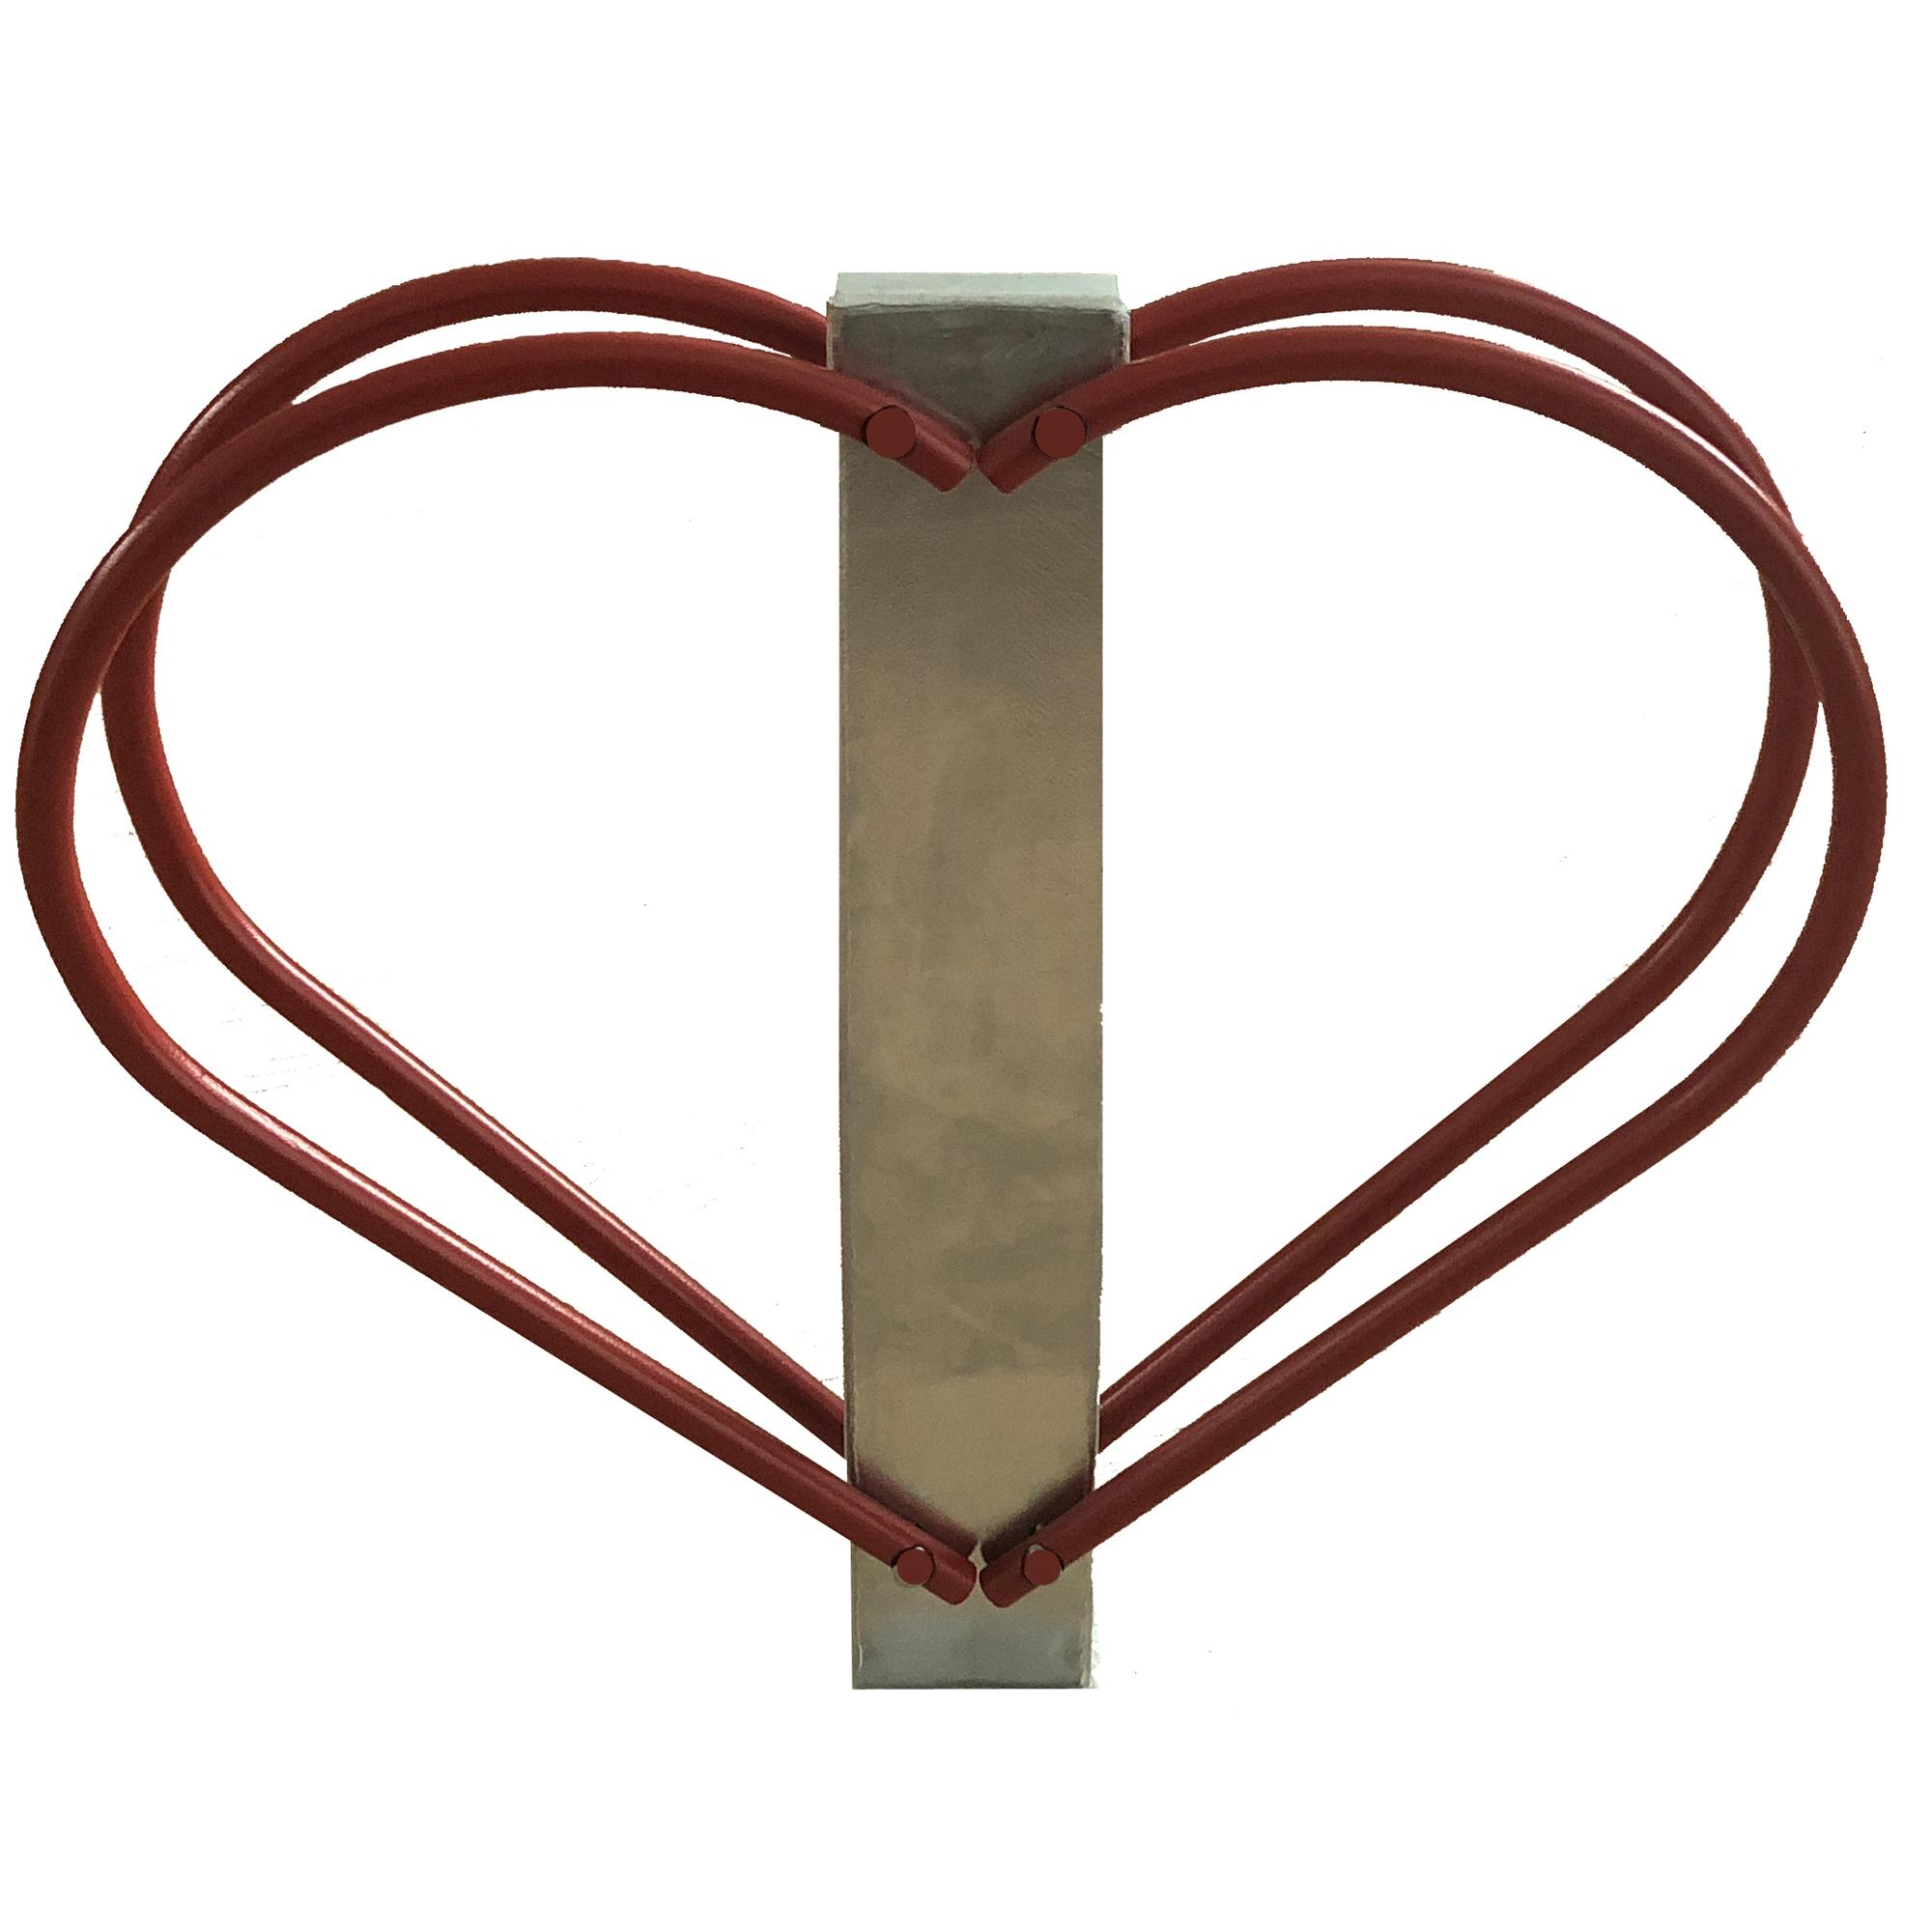 Heart cykelstativ